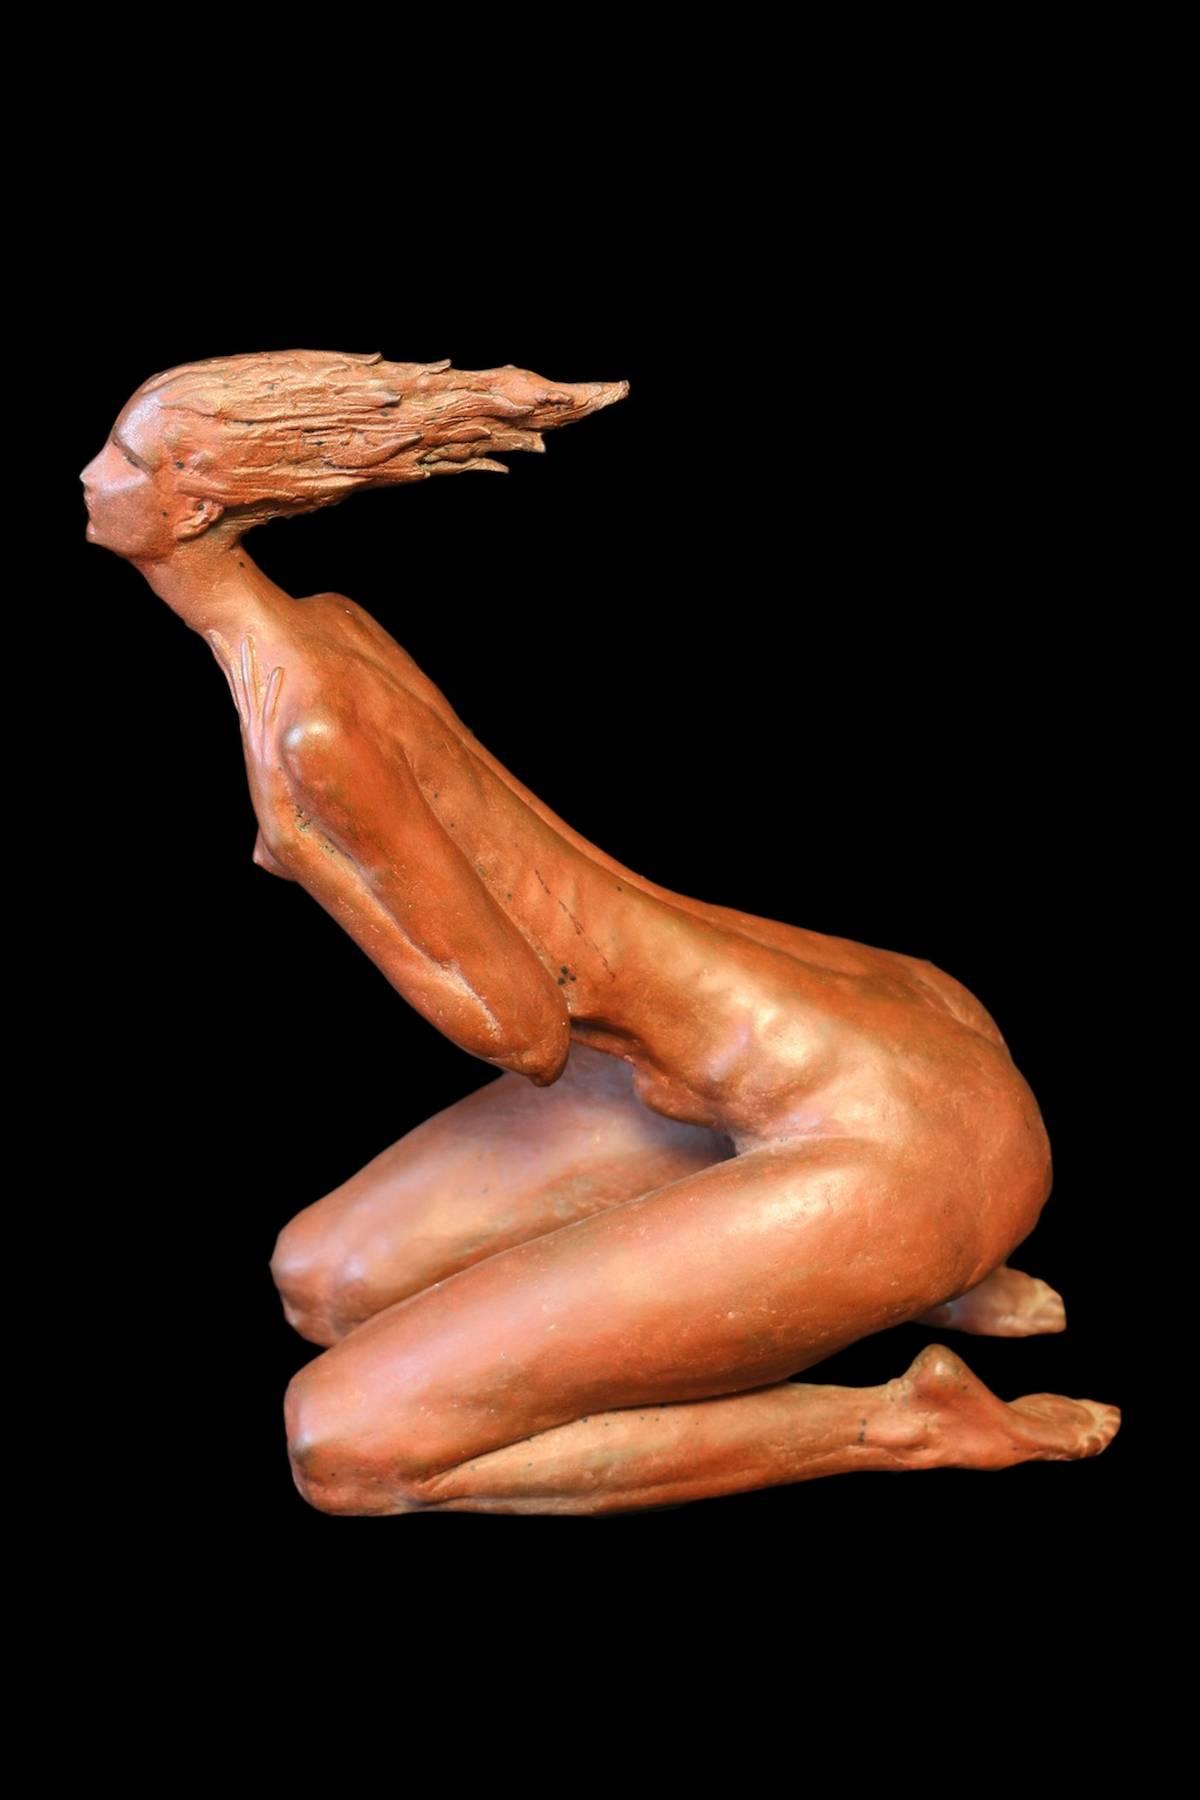 Aldo Falchi, 'Purificazione', 1981, bronzo 1-10, 19,5x27x12